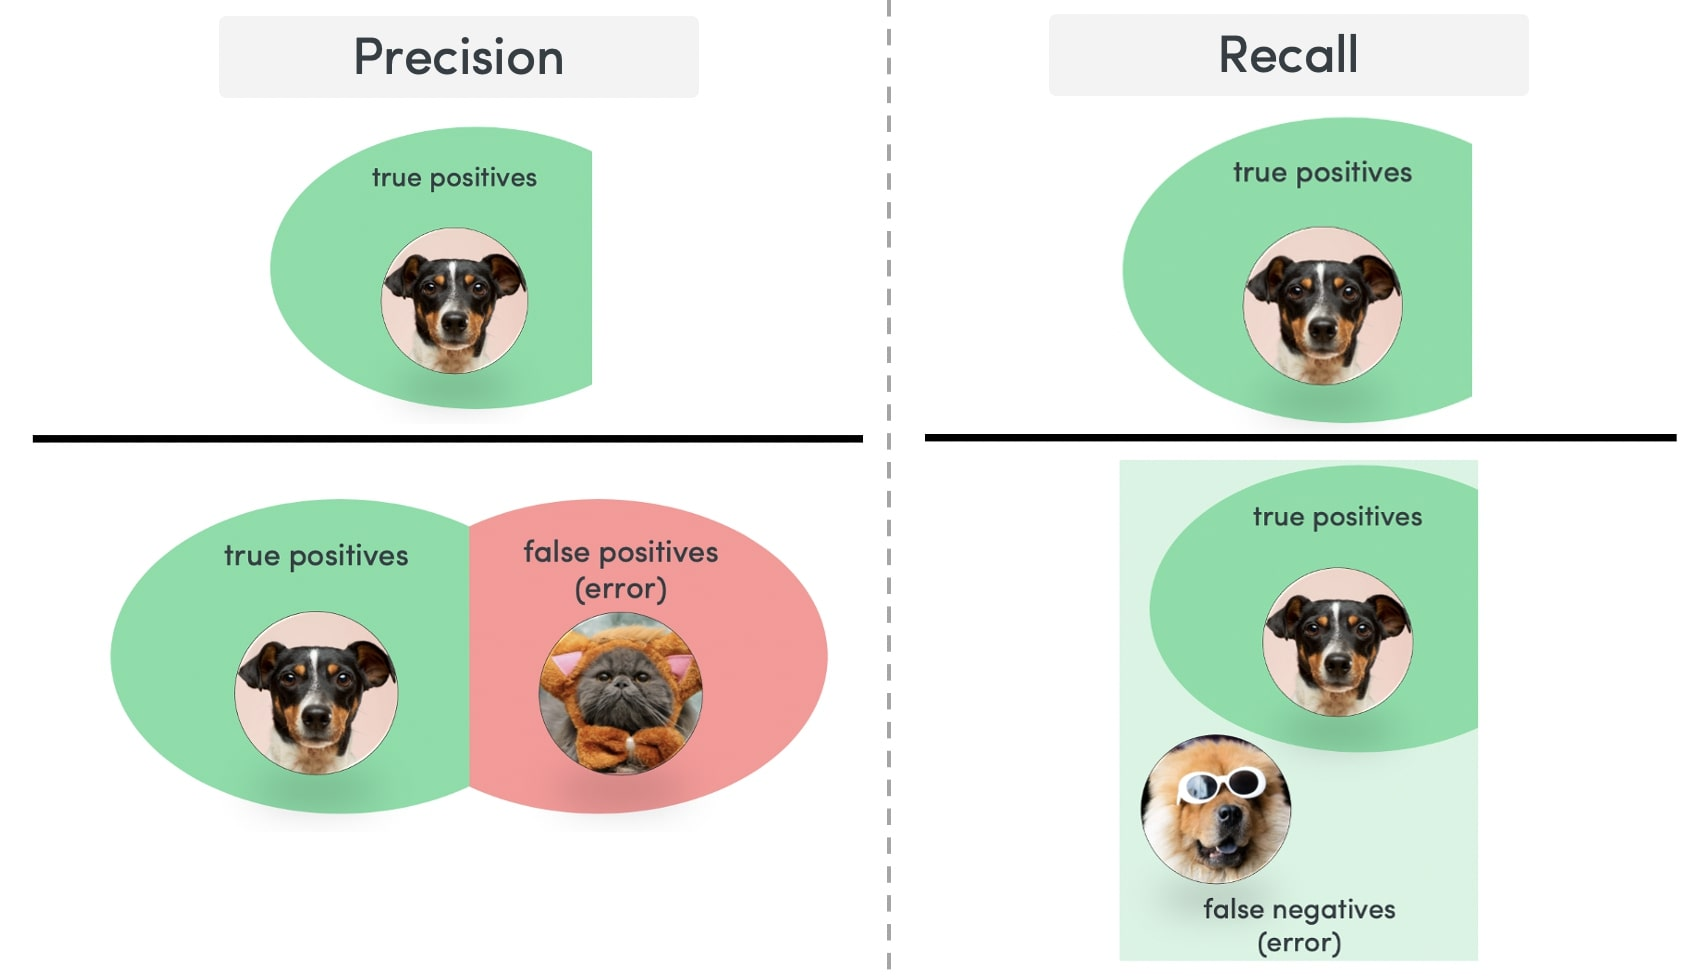 Precision and recall calculations in AI